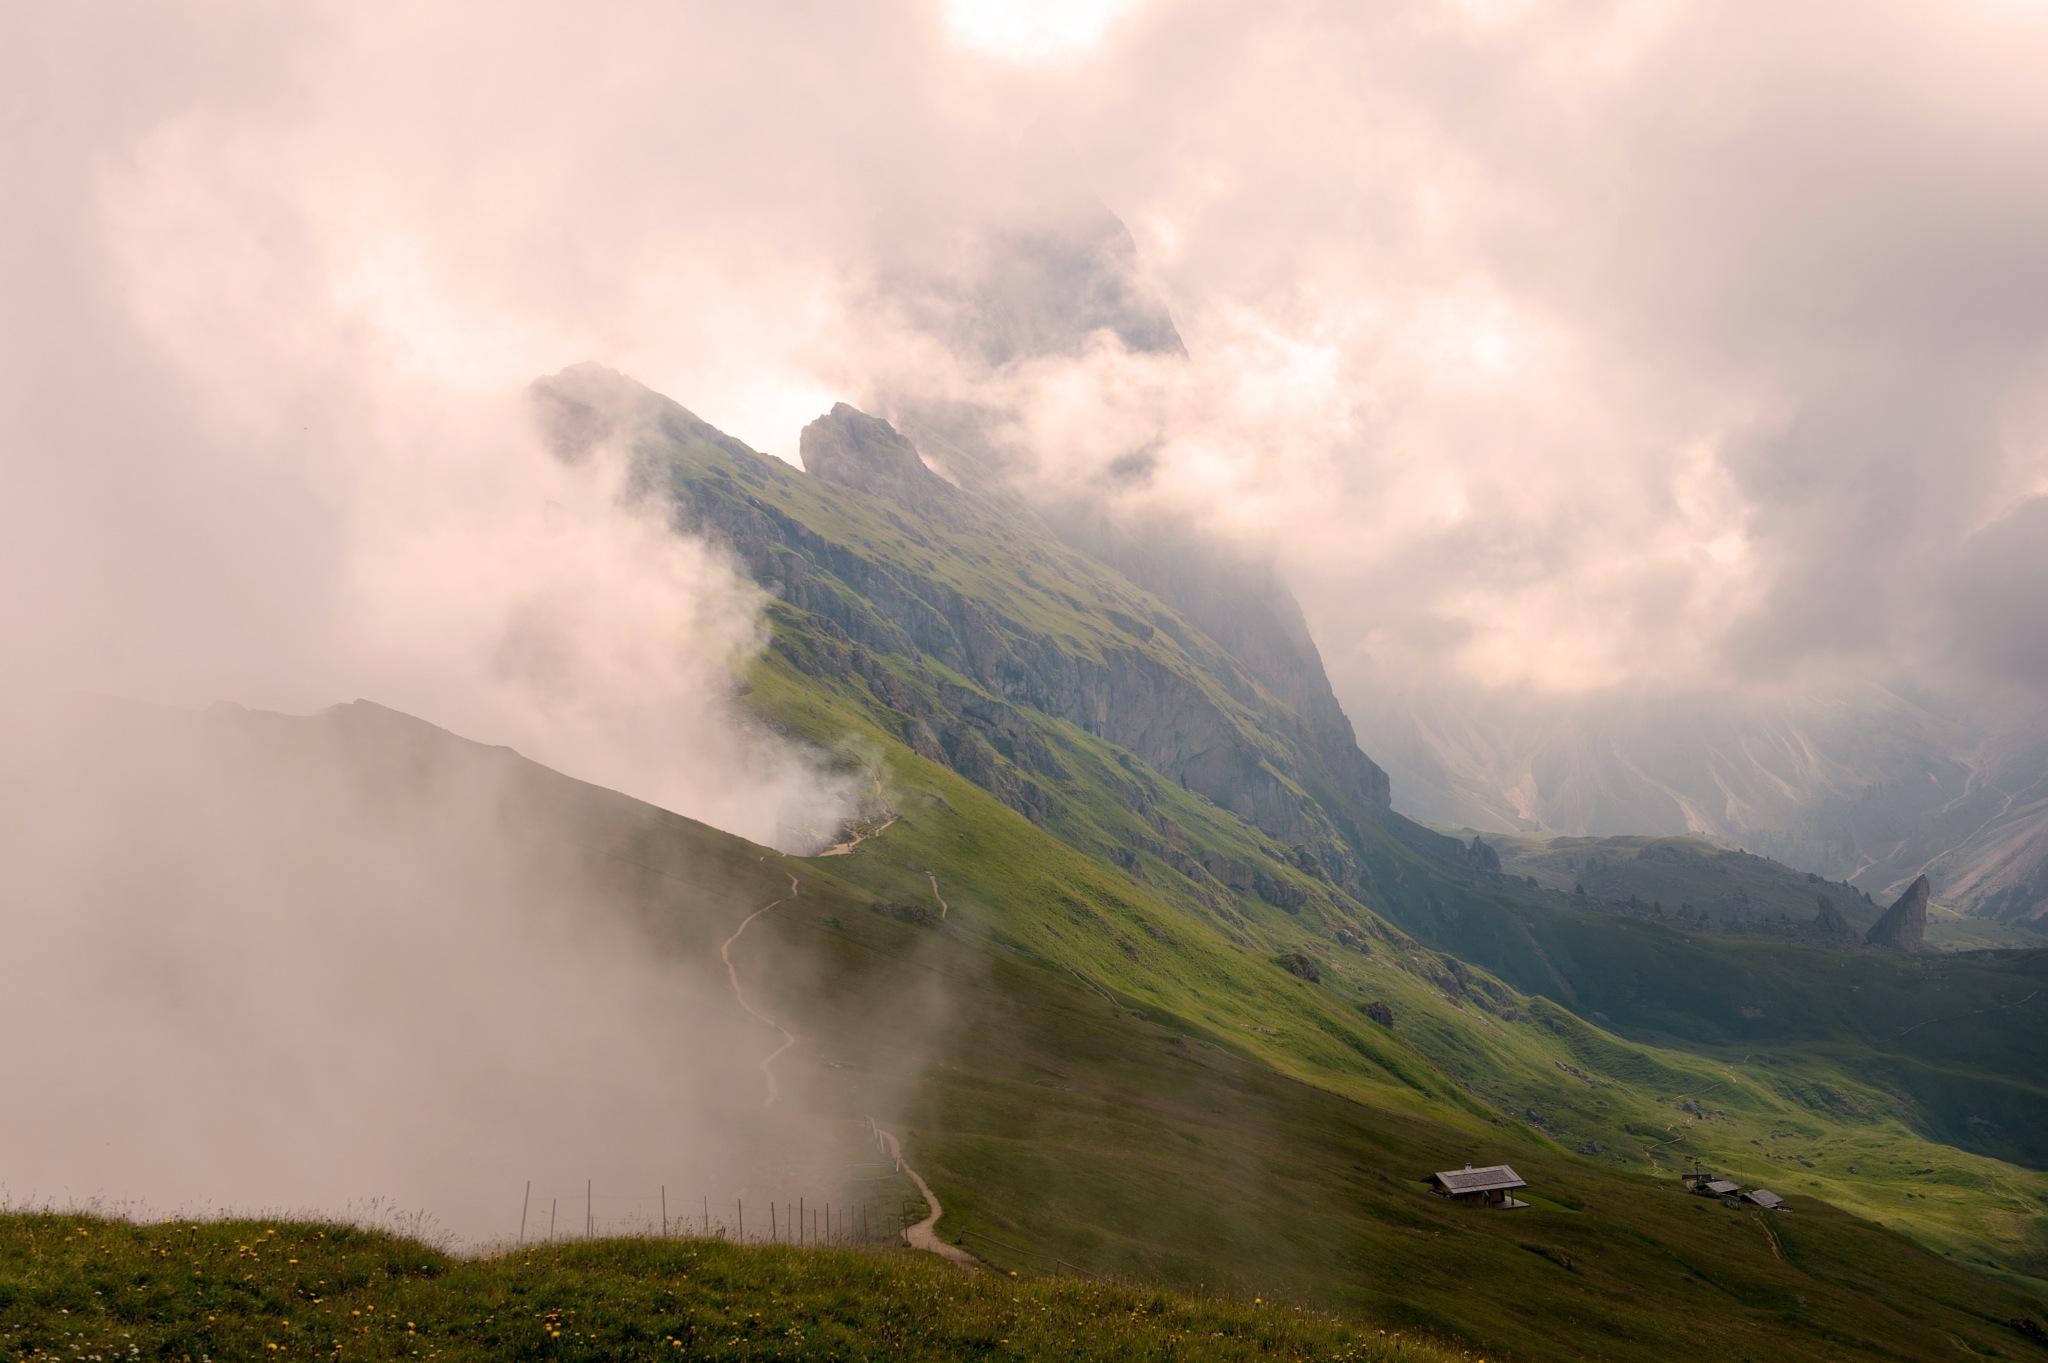 cloudy morning by maurizio senoner